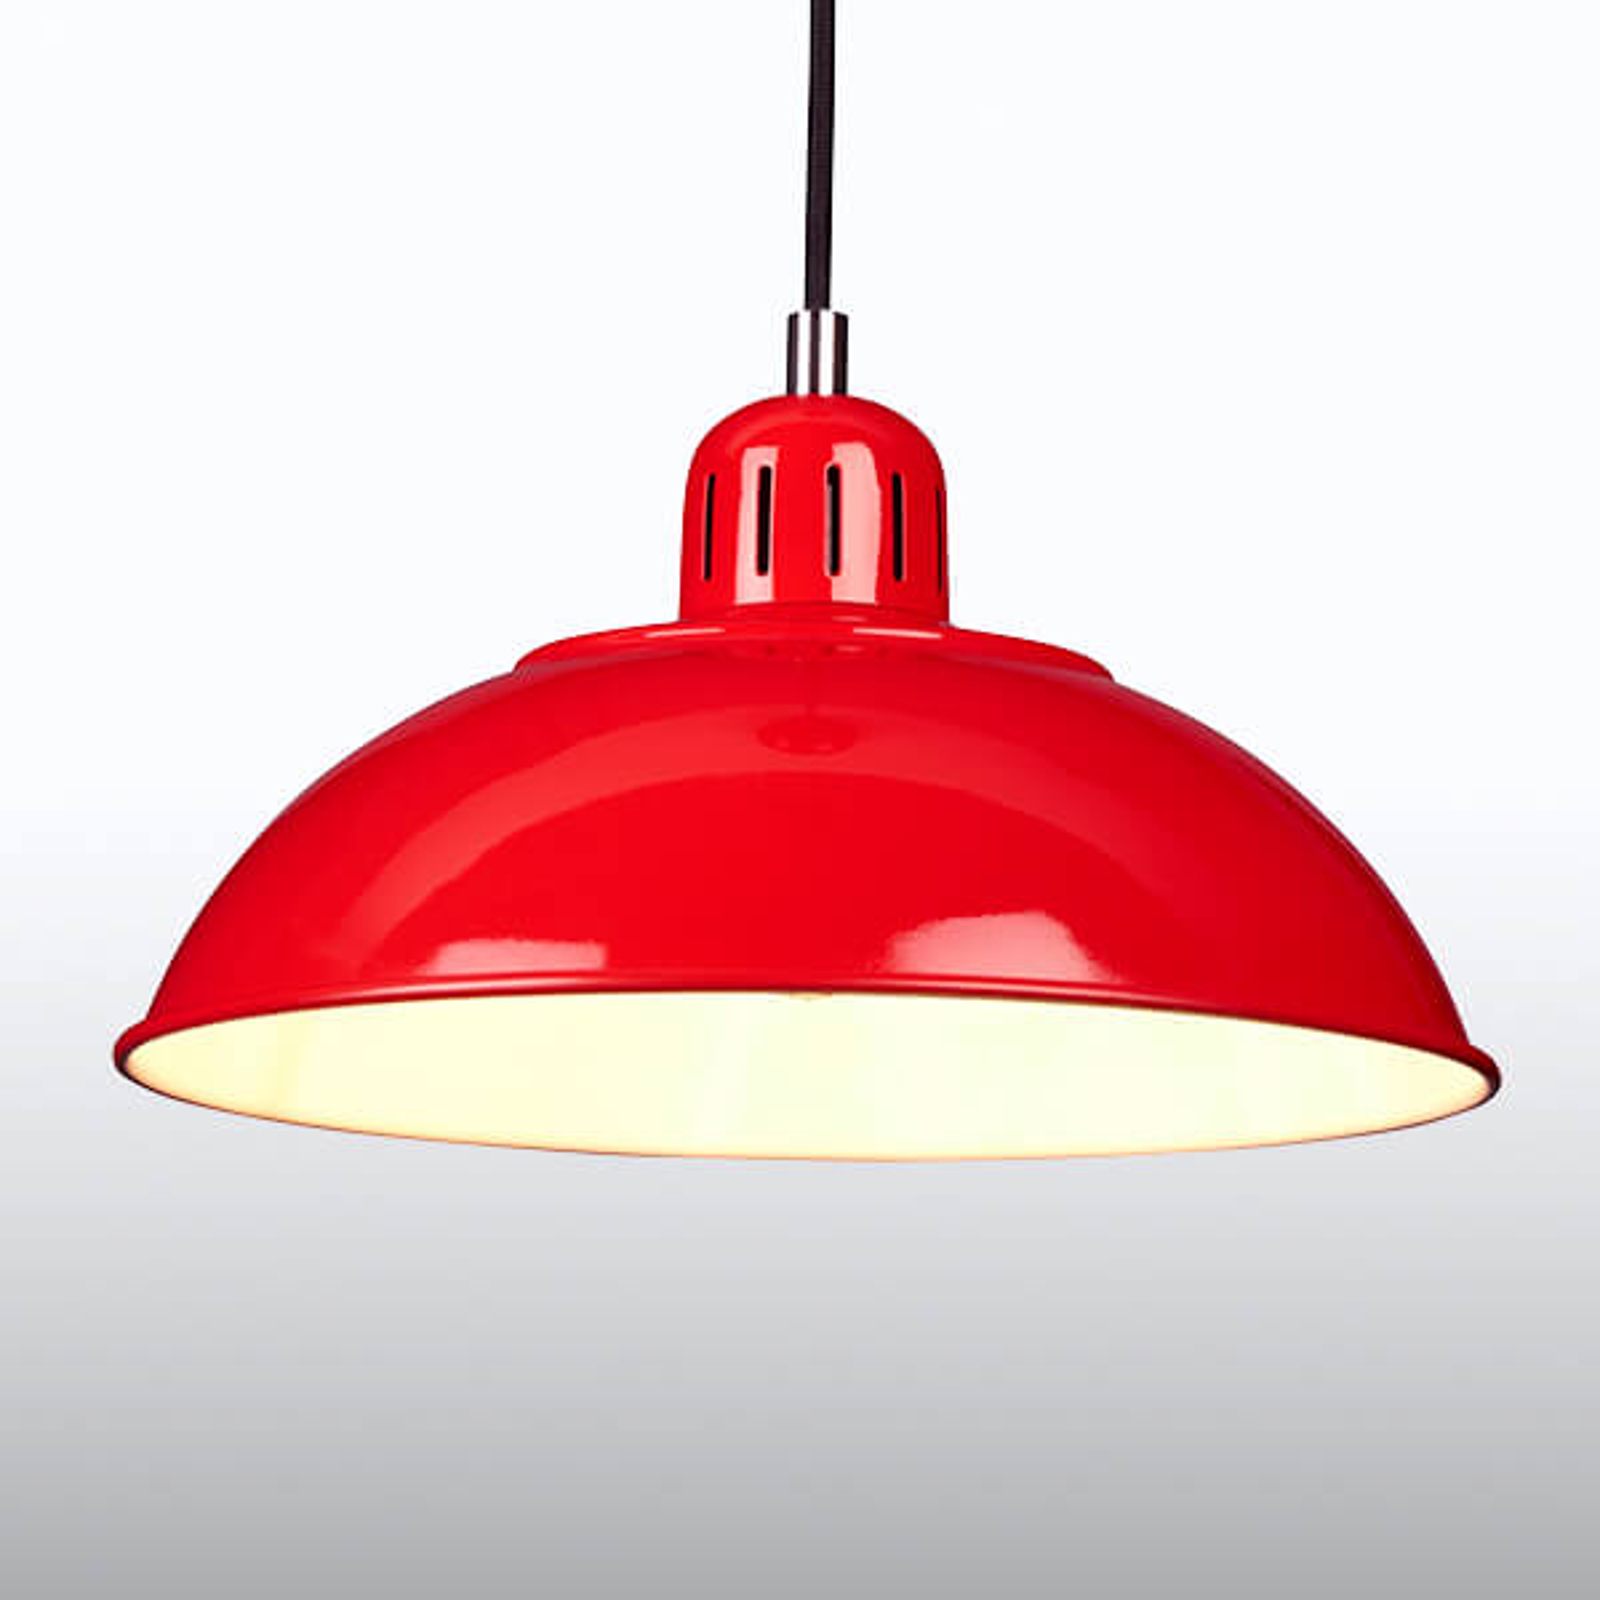 Rode hanglamp Franklin in retrodesign